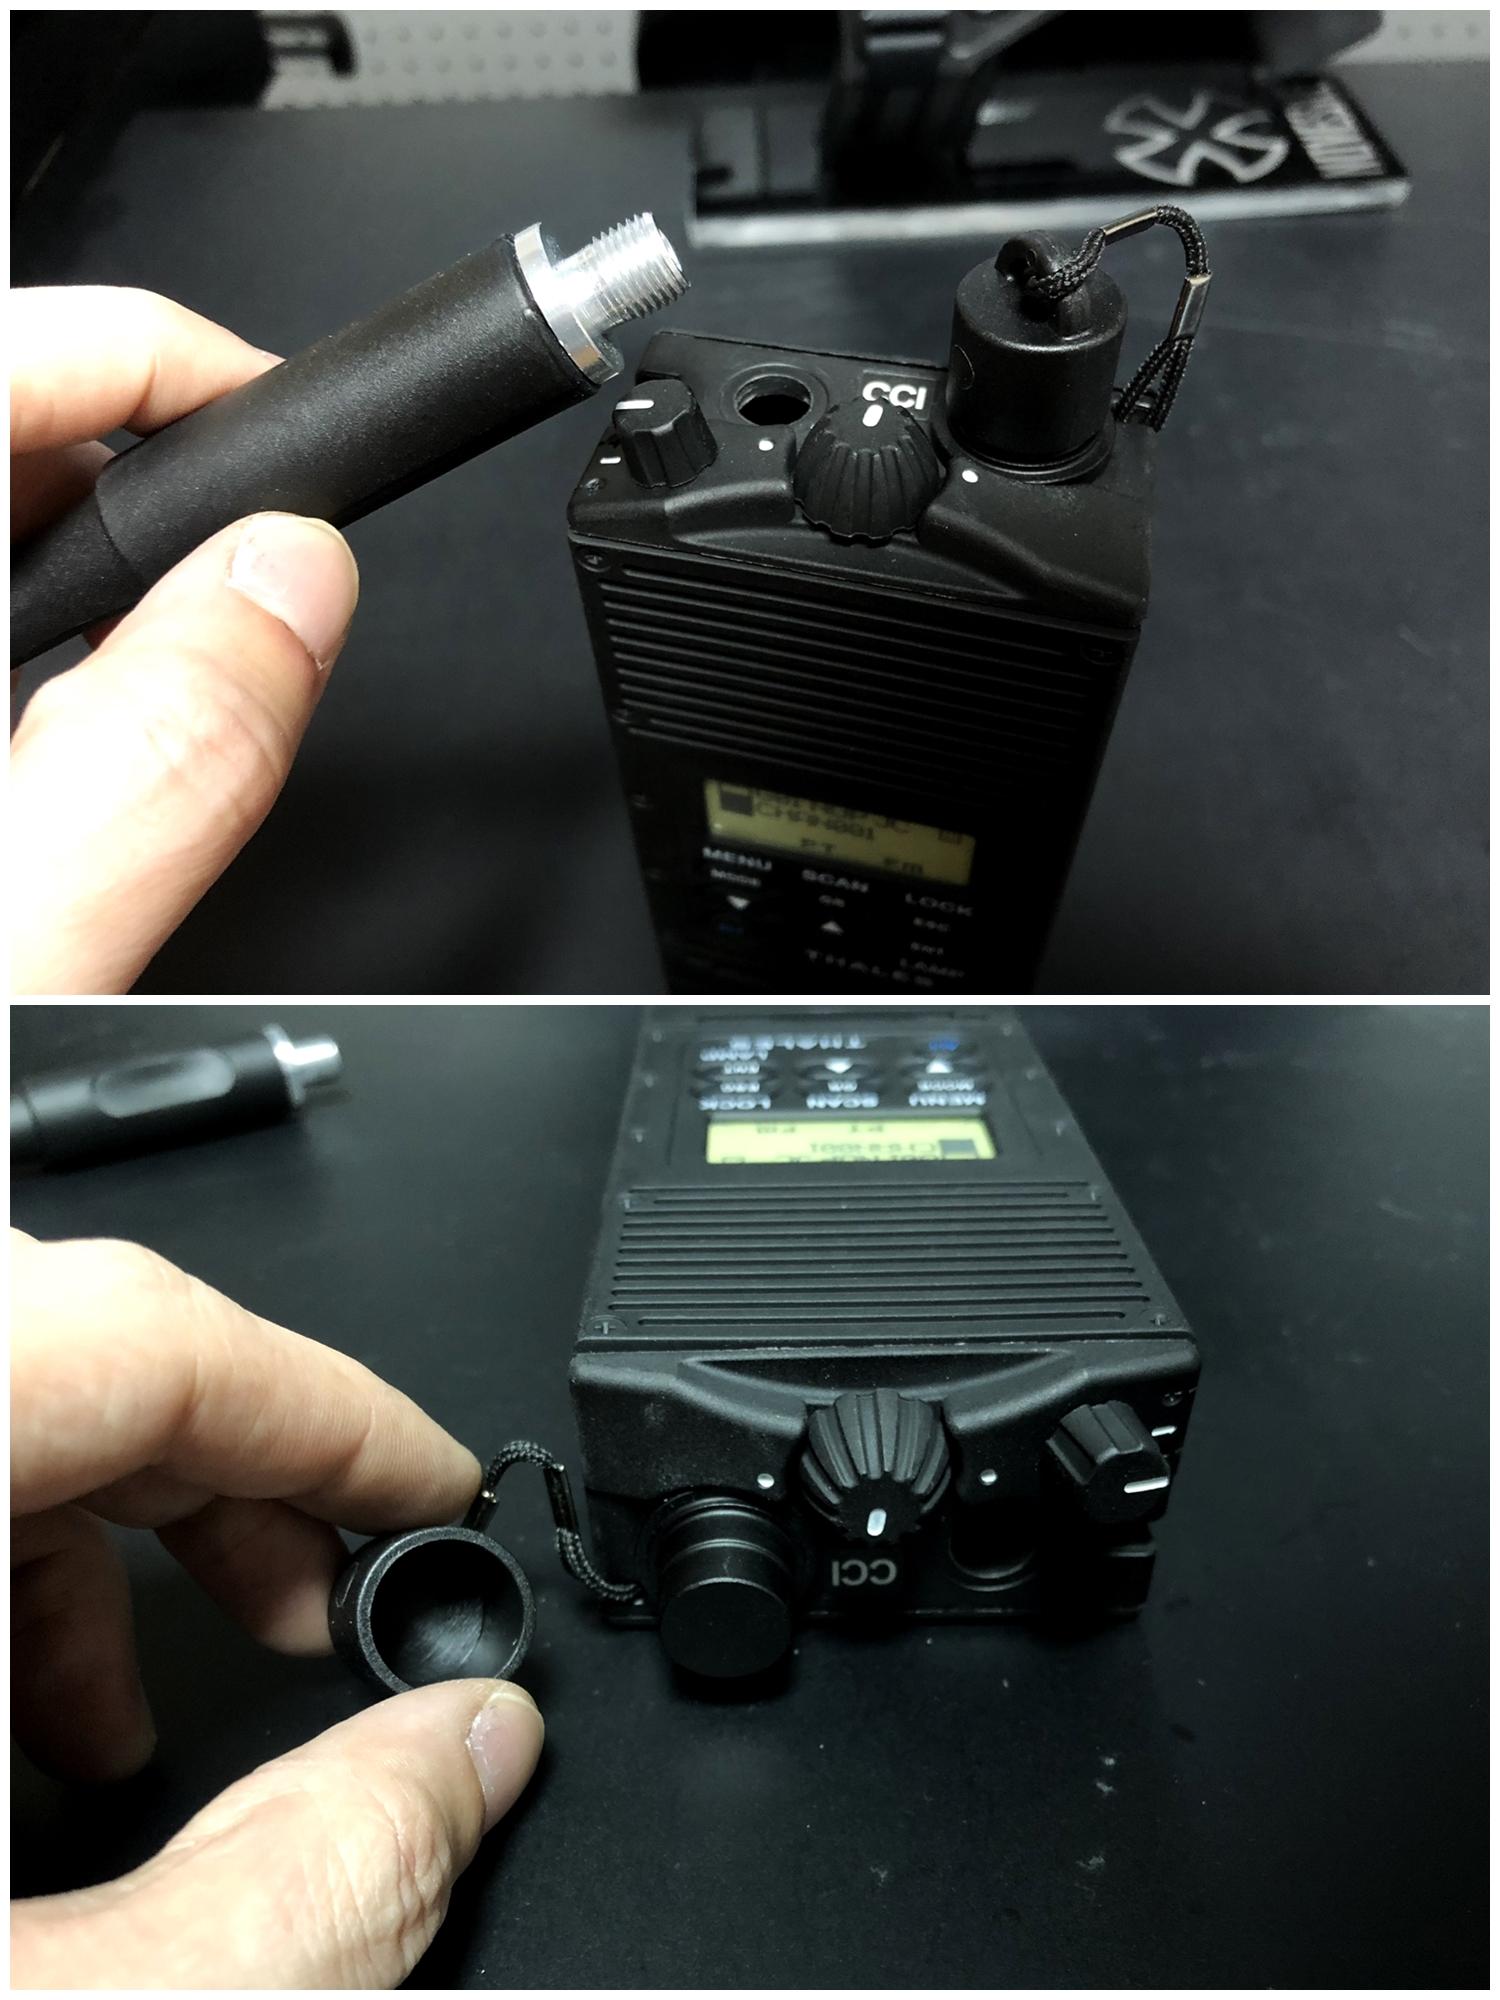 5 AN PRC 148 AN PRC 152 TYPE レプリカ ダミーラジオ 装備 コスプレ 実物 リアル サバゲー オススメ 購入 レビュー カスタム 改造